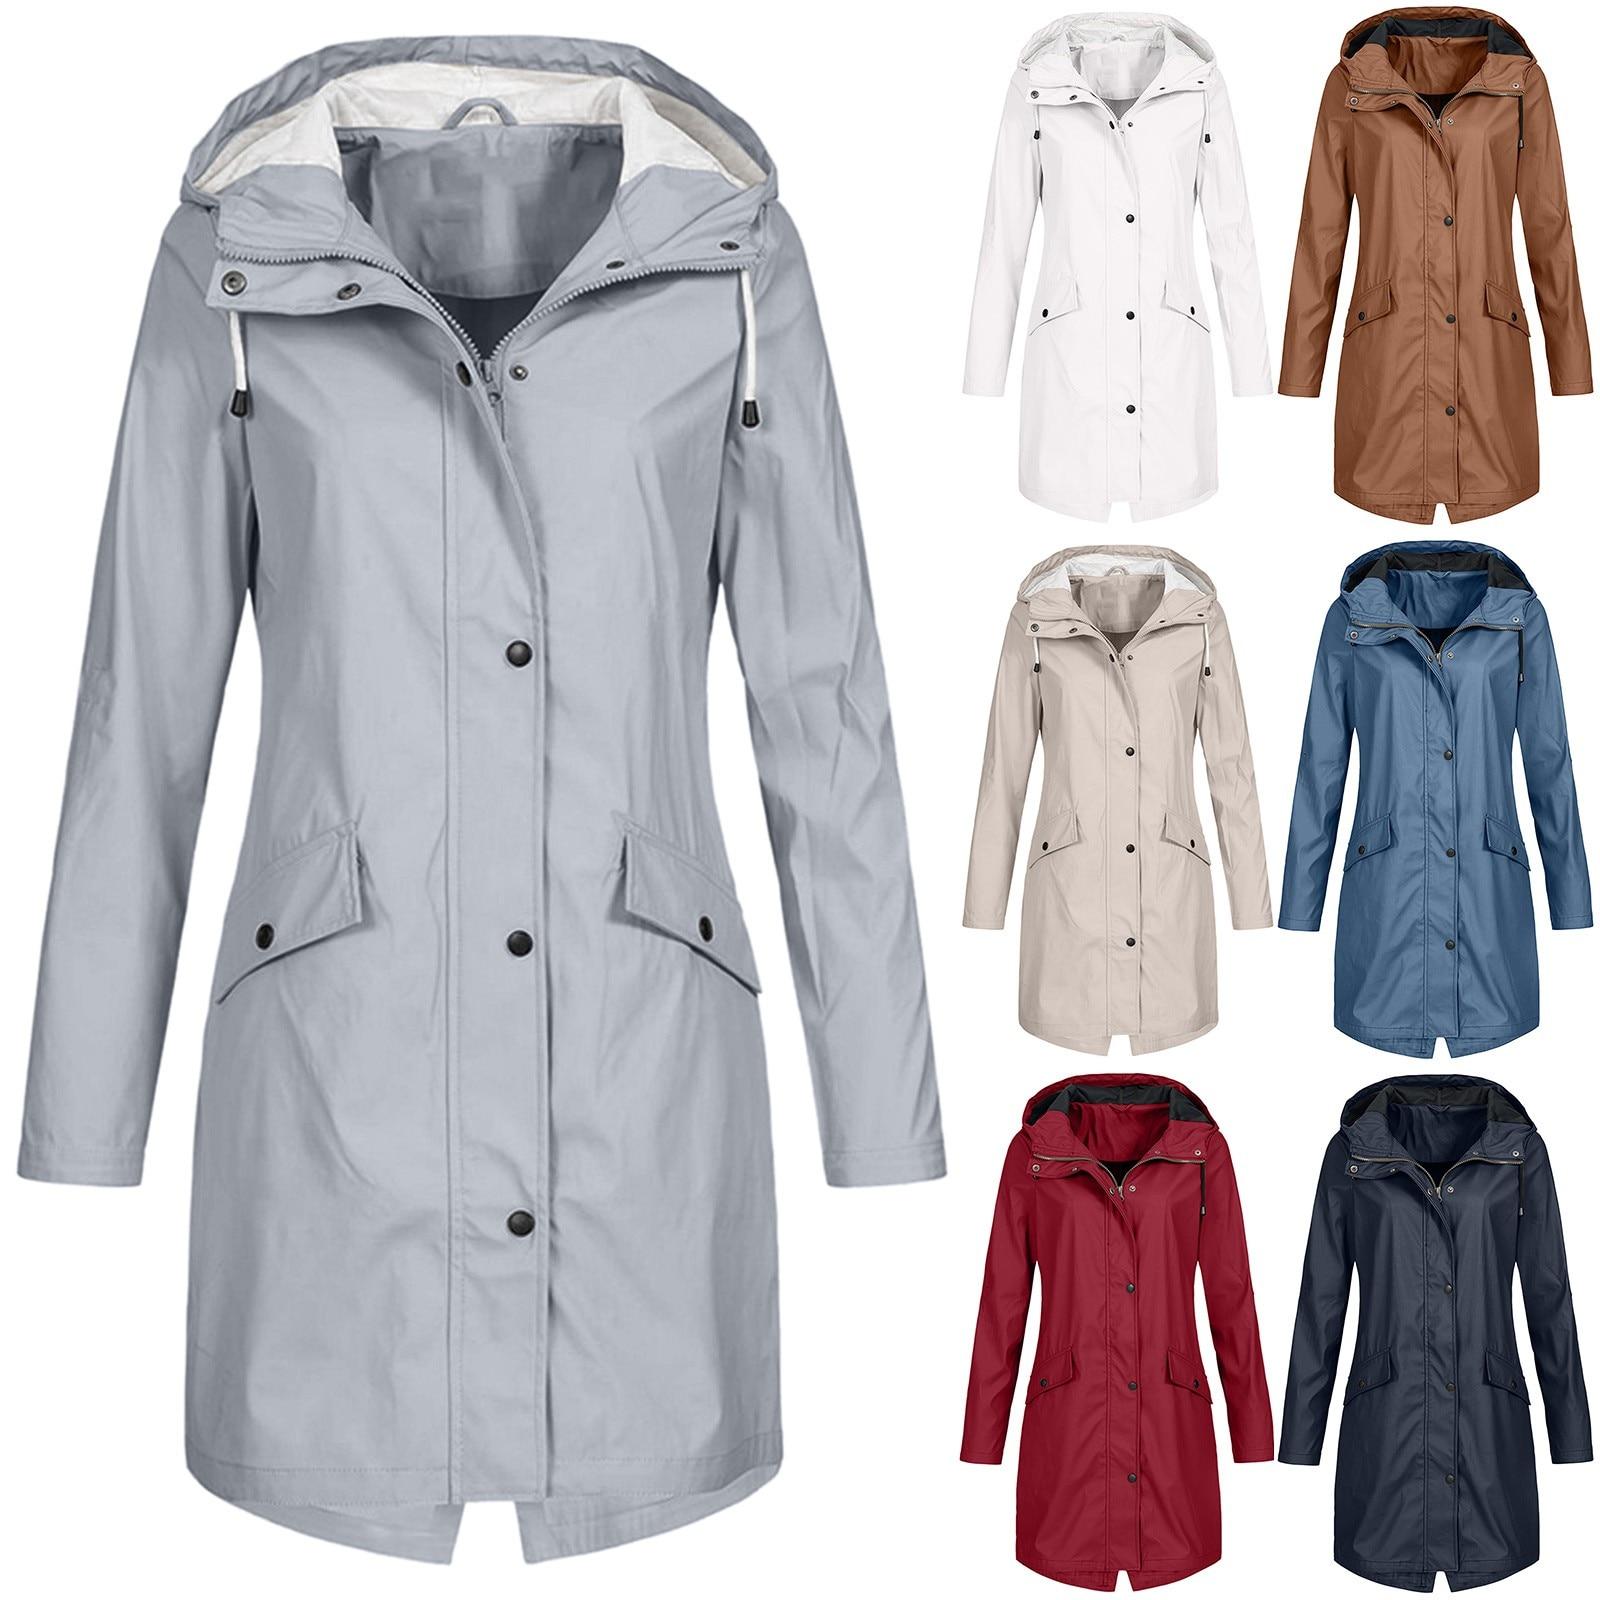 Coat Jacket Hiking-Clothes Waterproof Women Lightweight Outdoor Transition